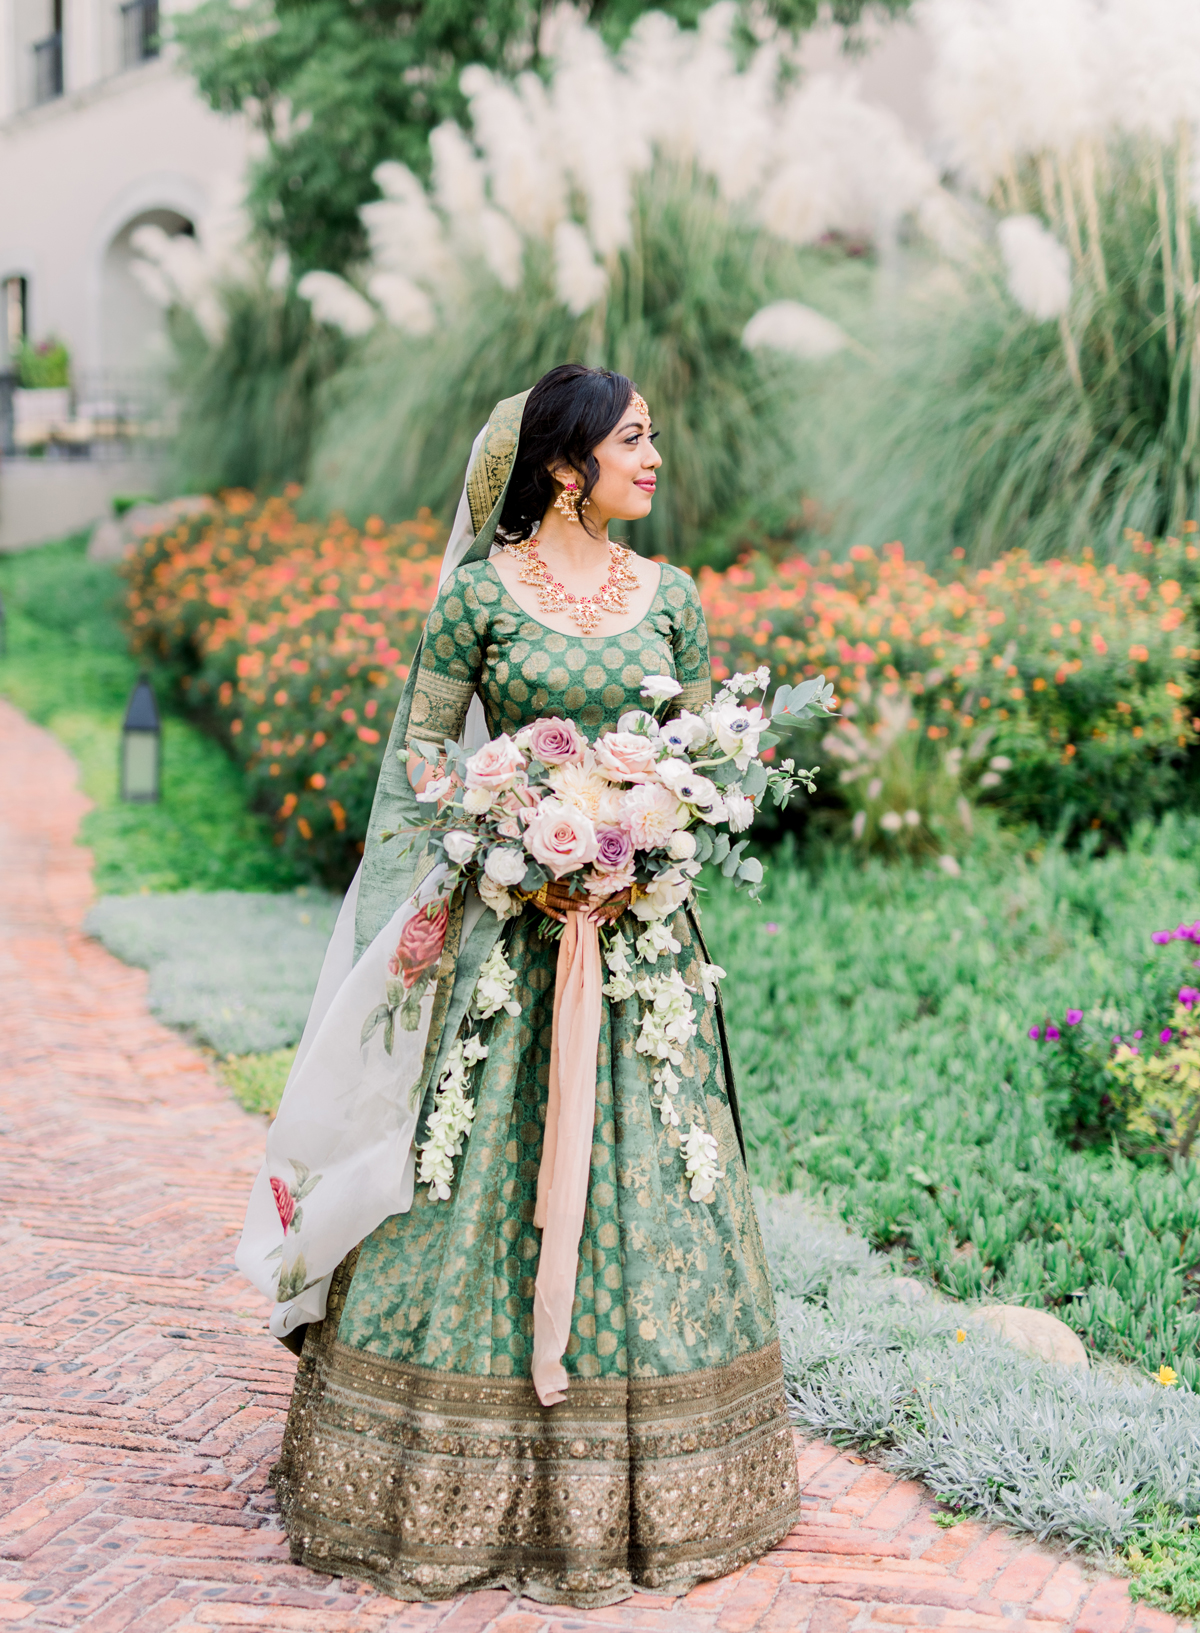 bride wearing green patterned lehenga wedding dress